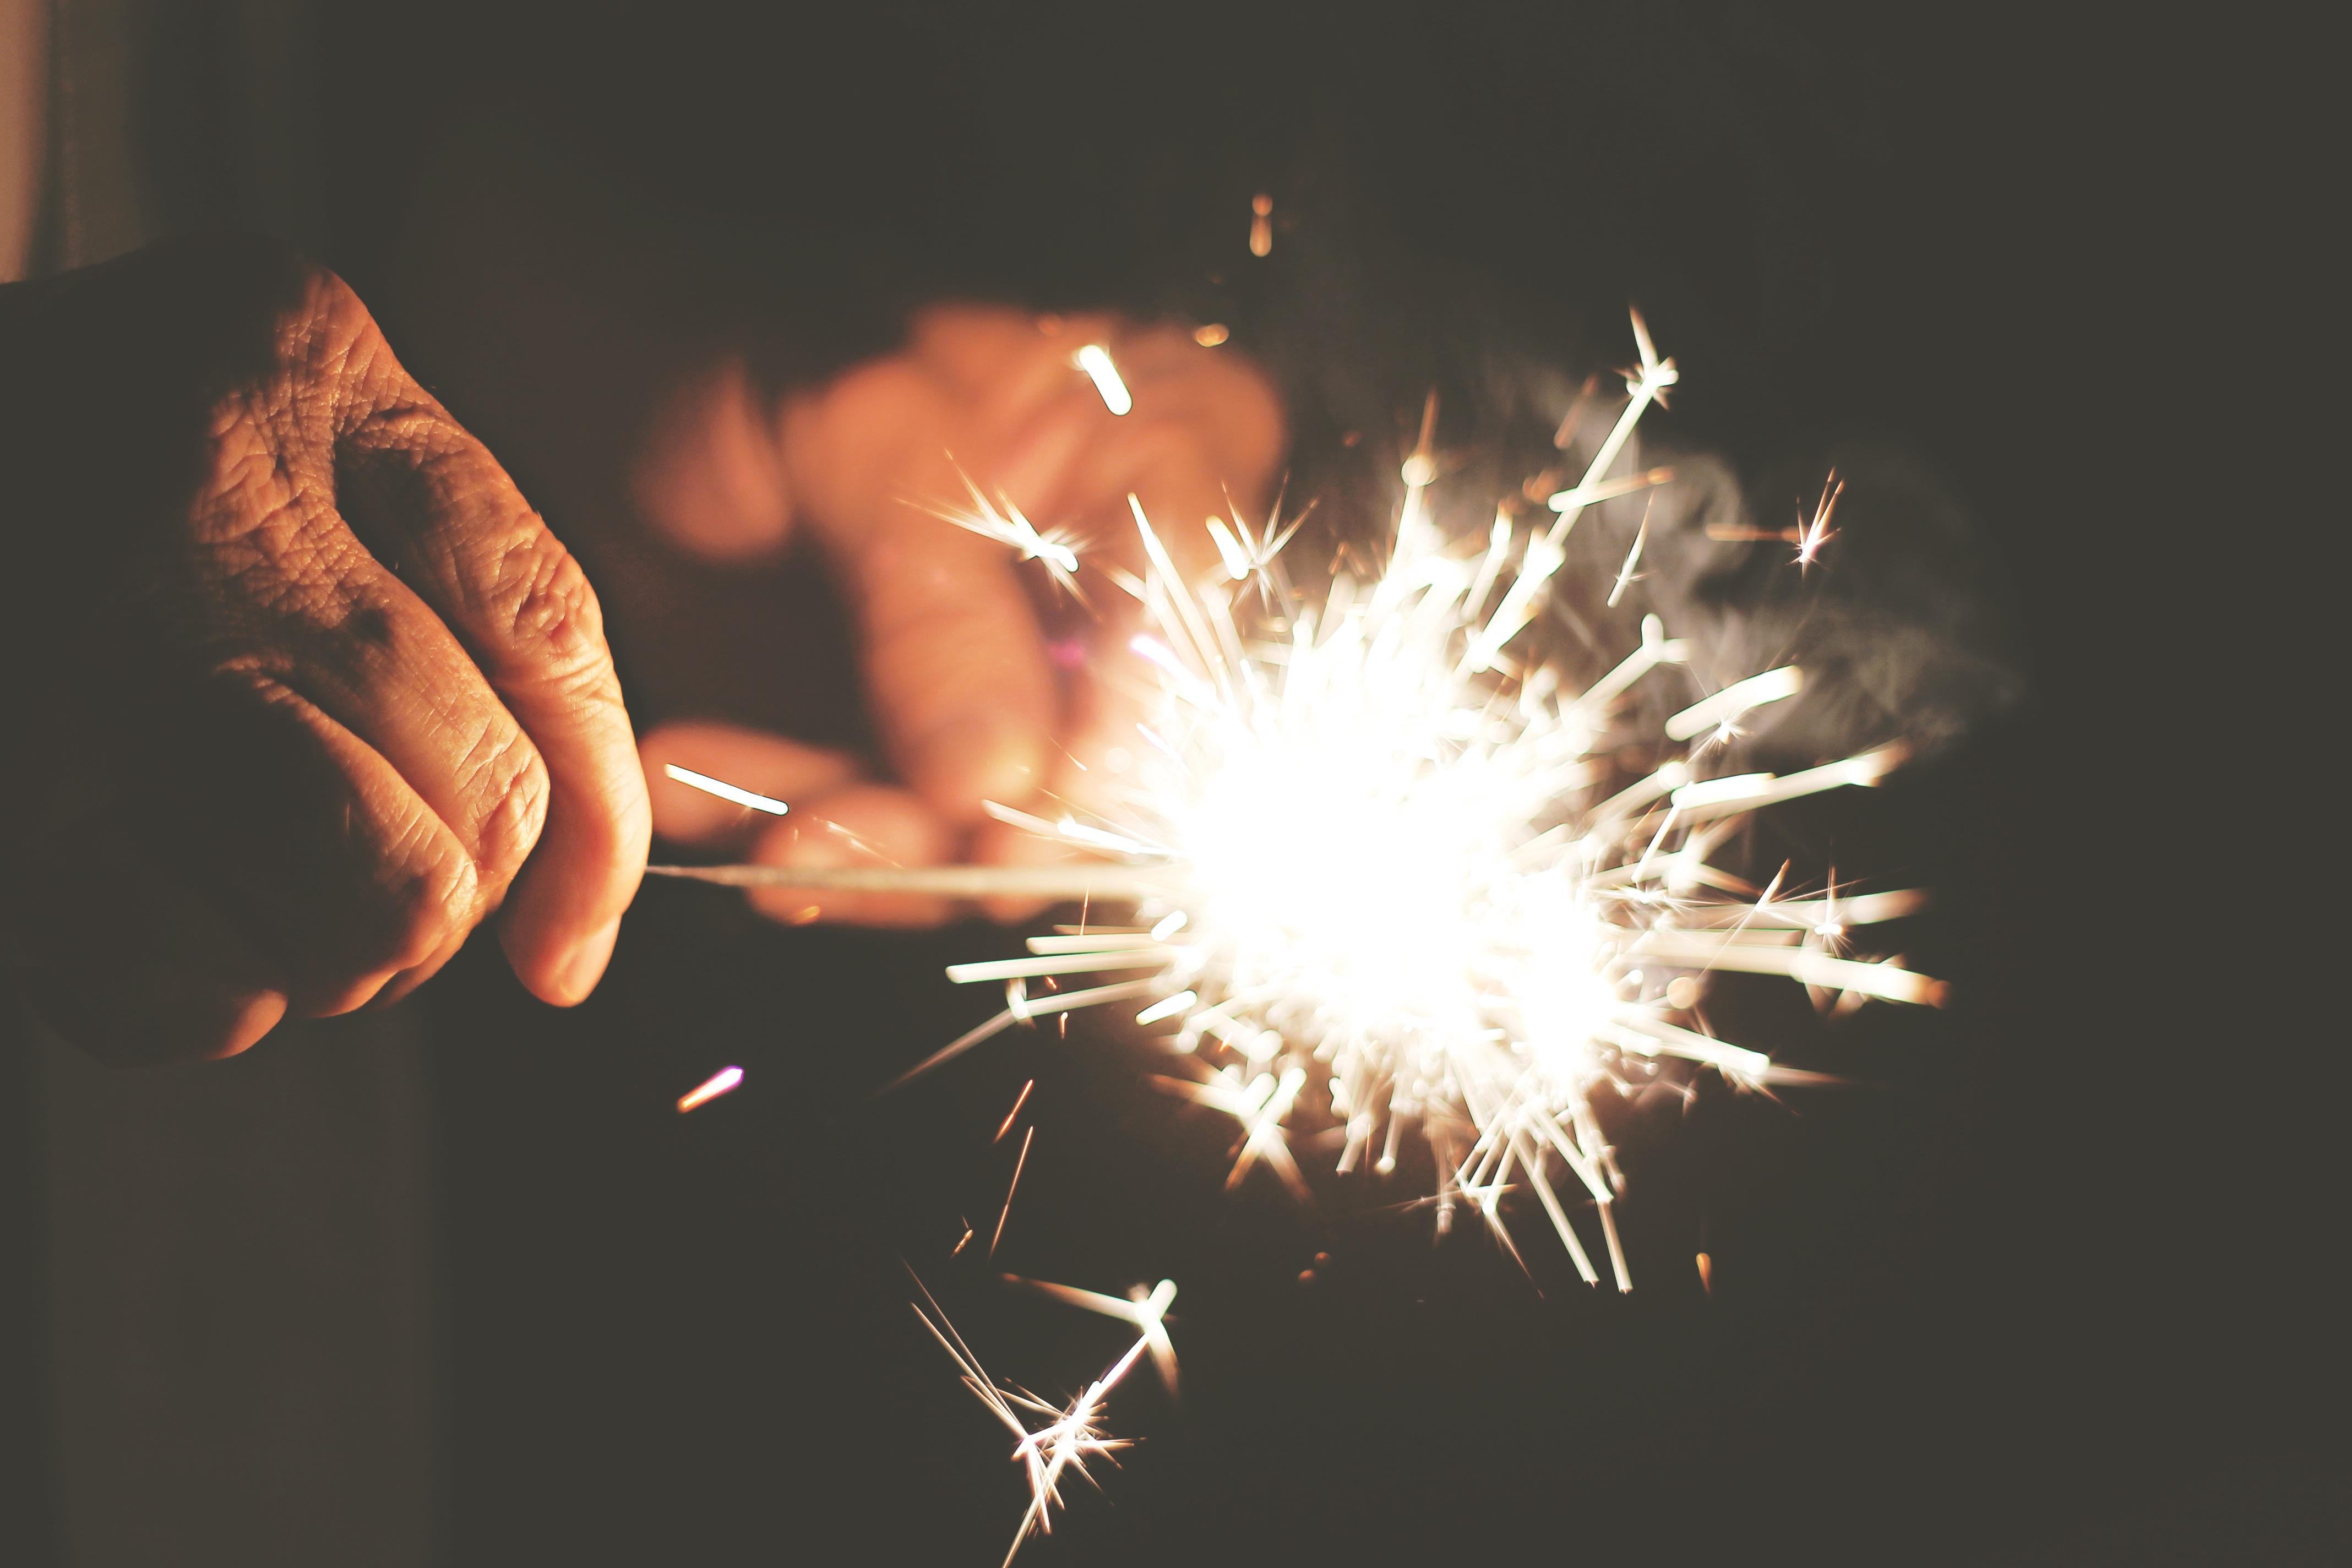 Celebrating Epiphany at Church: 5 Fresh Ideas